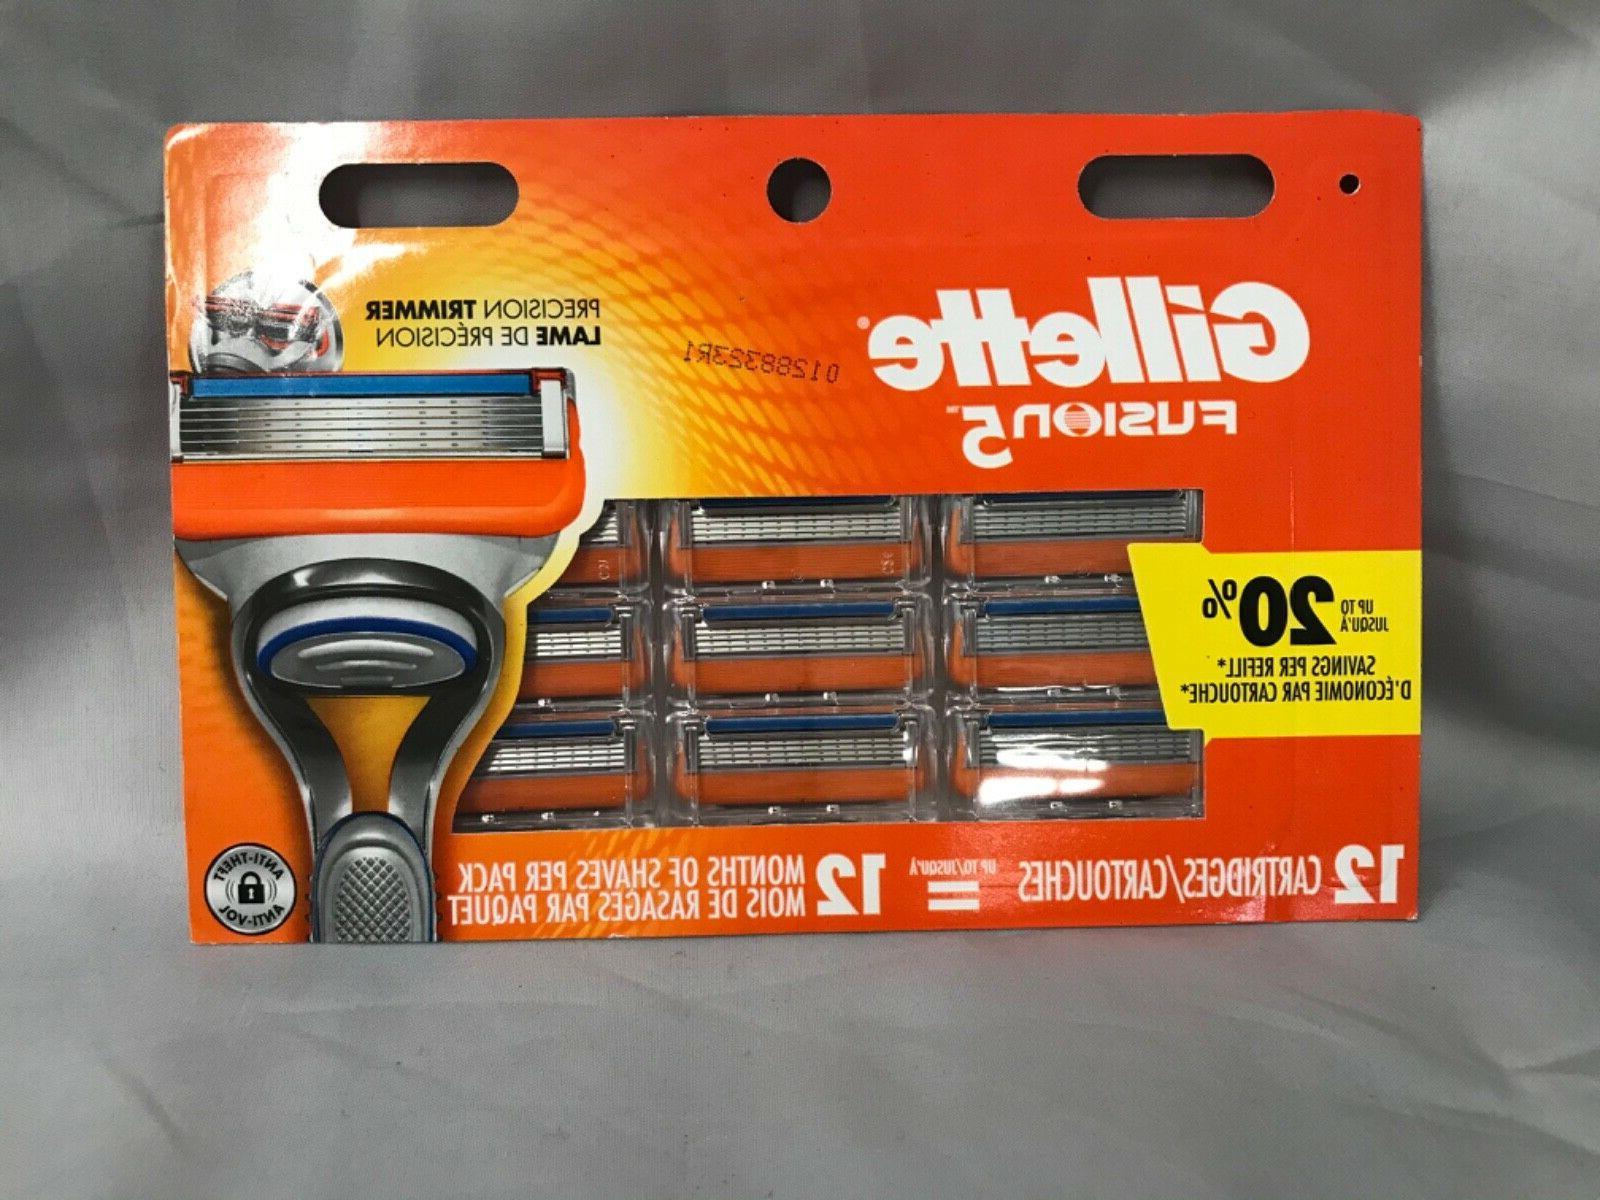 12 fusion 5 fusion5 cartridges razor blades